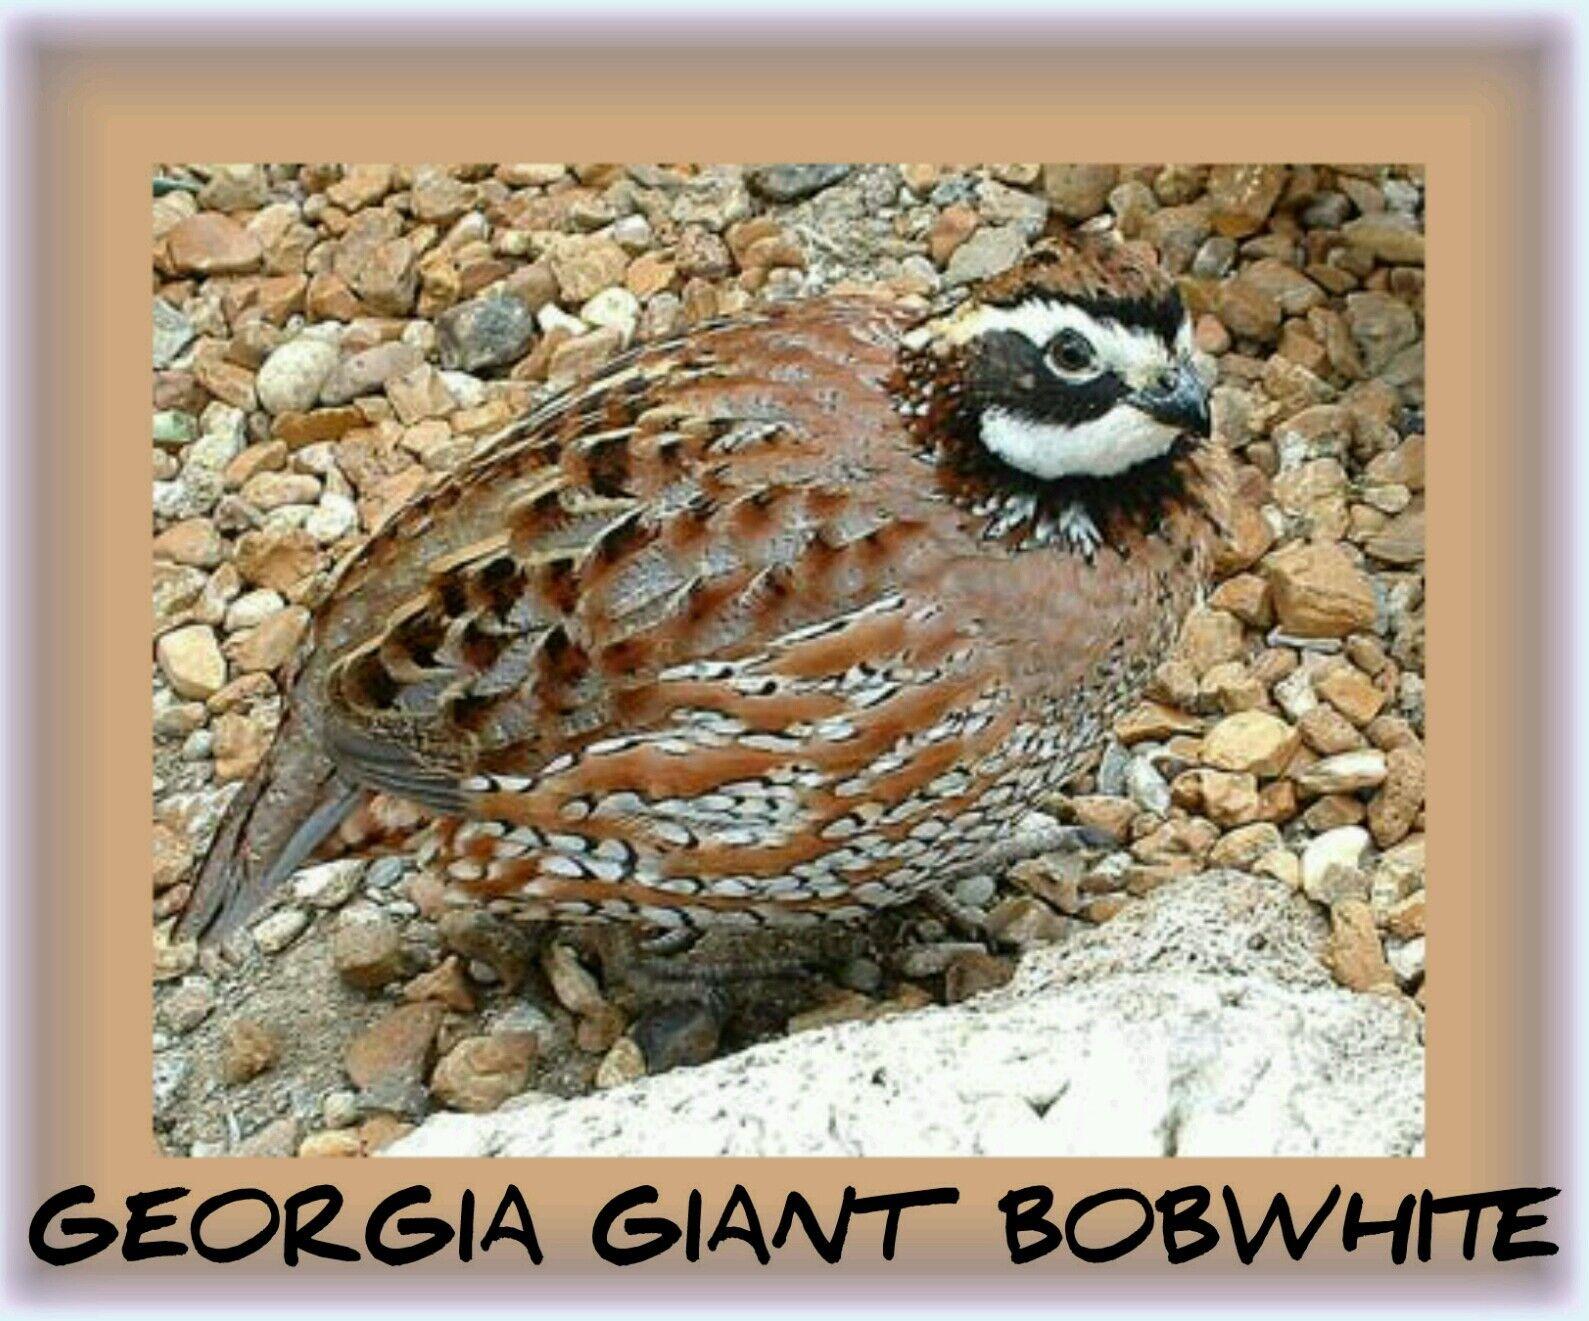 600 Georgia Giant Bobwhite Quail Hatching Eggs